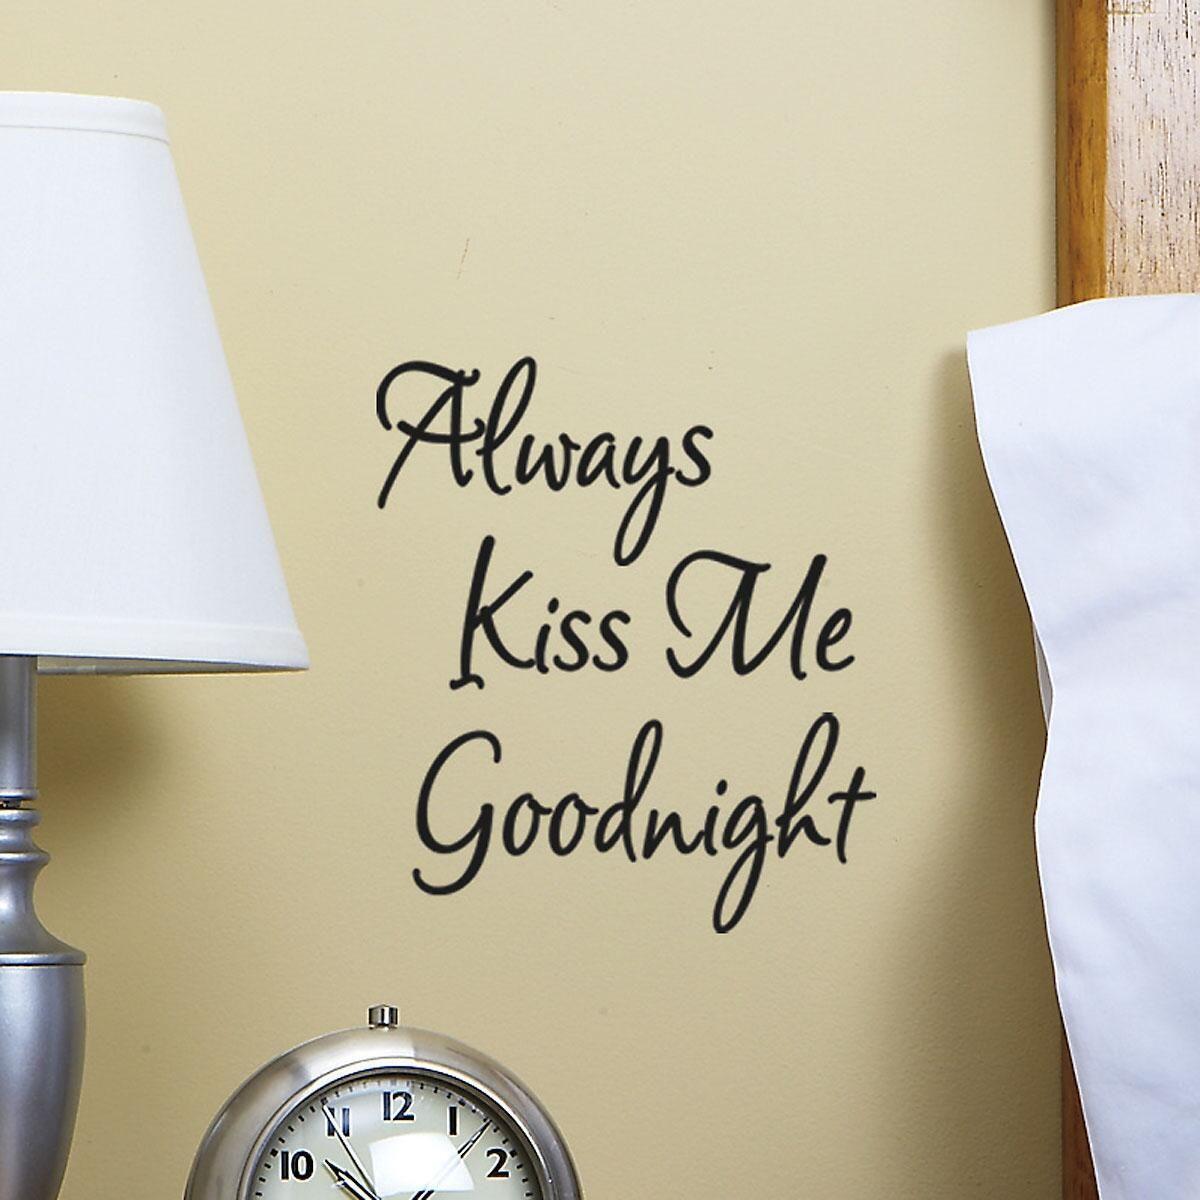 Always Kiss Me Goodnight Vinyl Wall Words